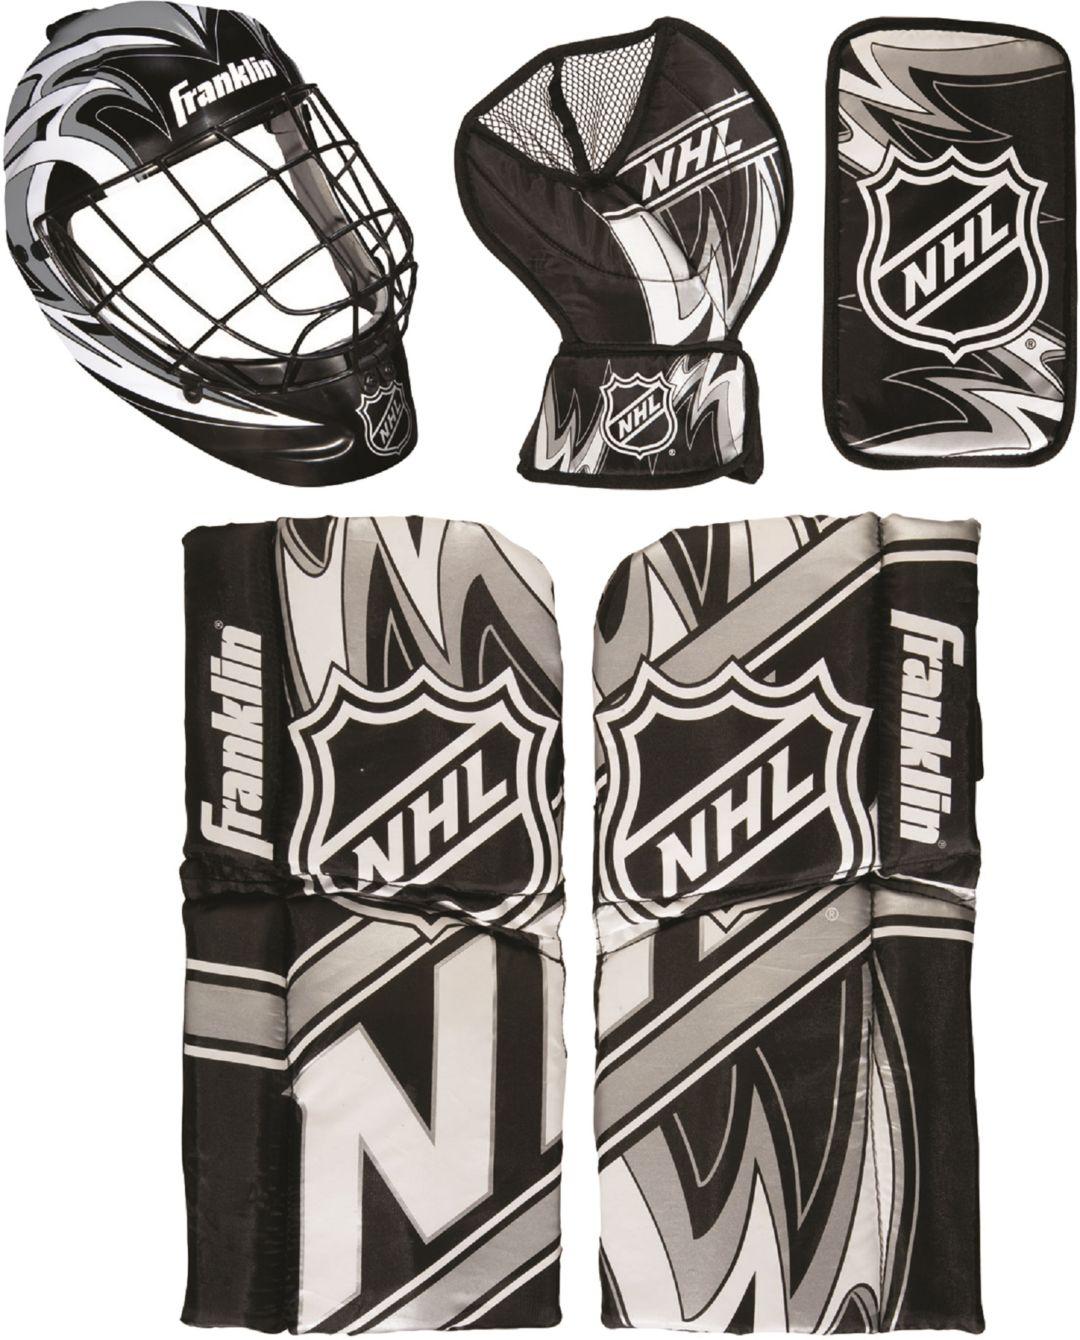 Franklin Nhl Mini Hockey Goalie Equipment And Mask Set Dick S